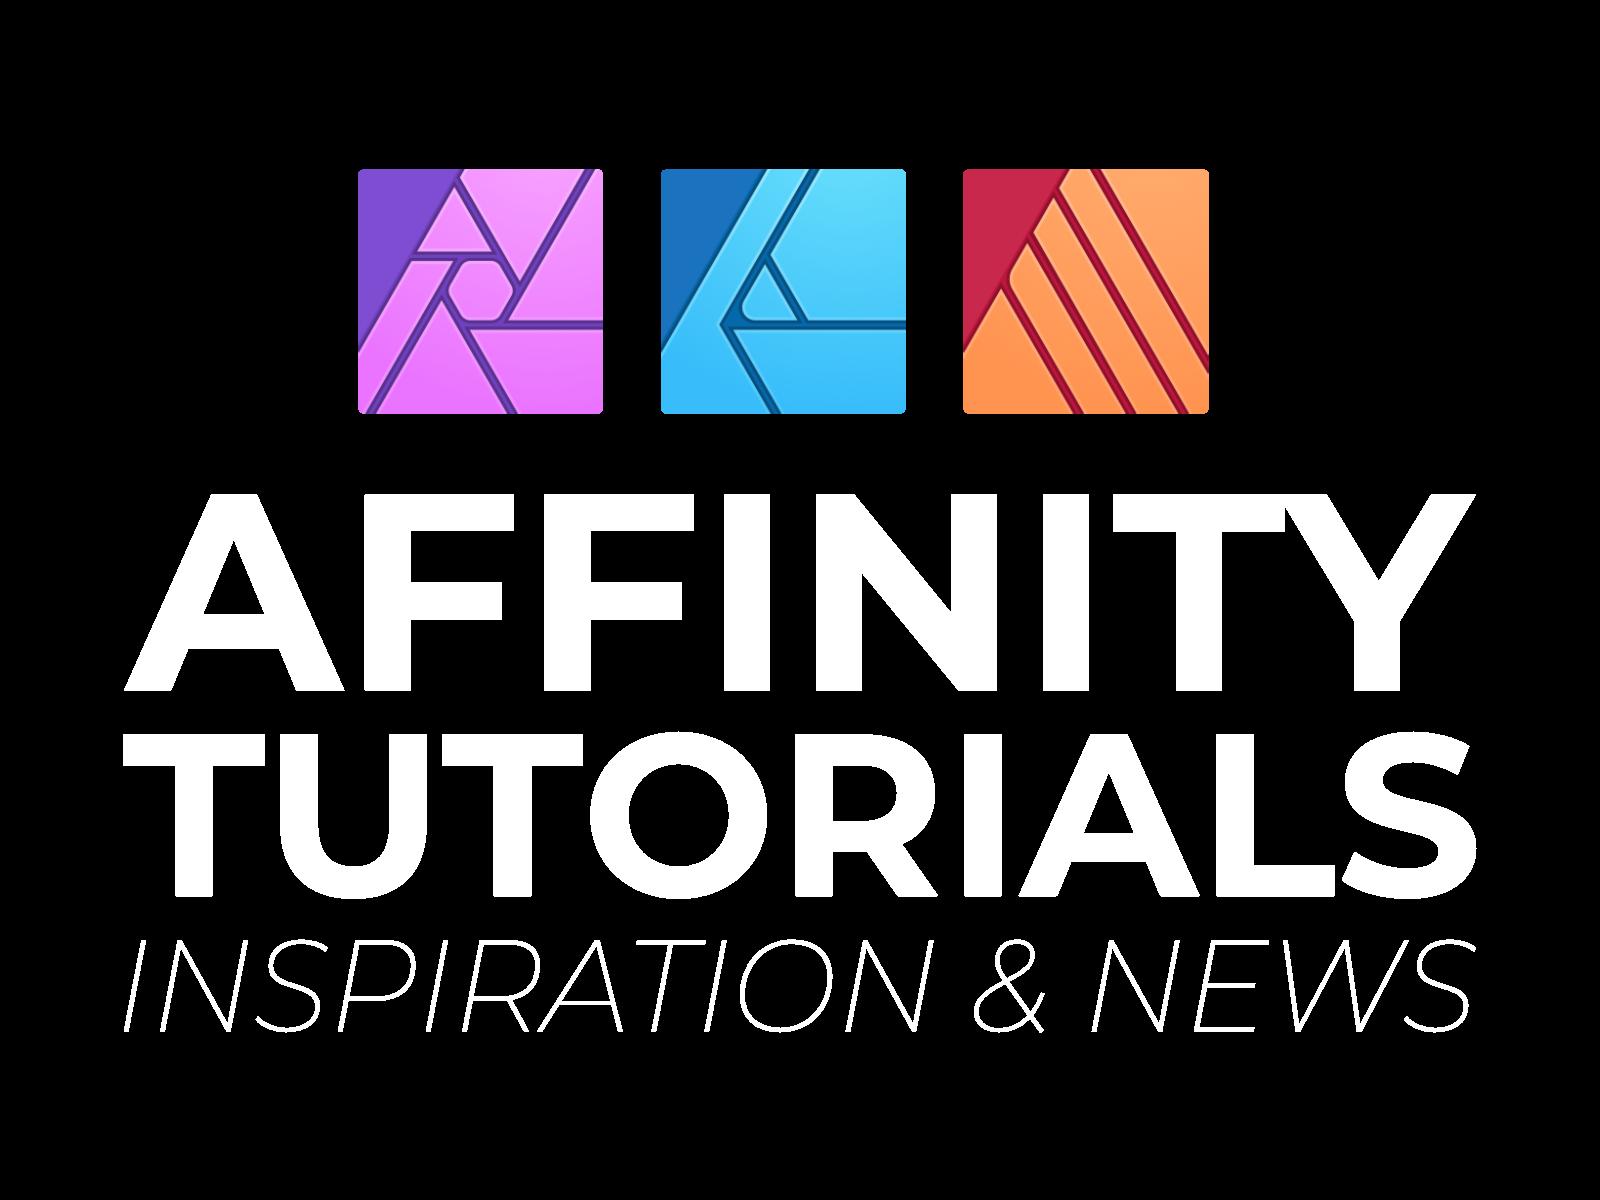 Affinity Tutorials